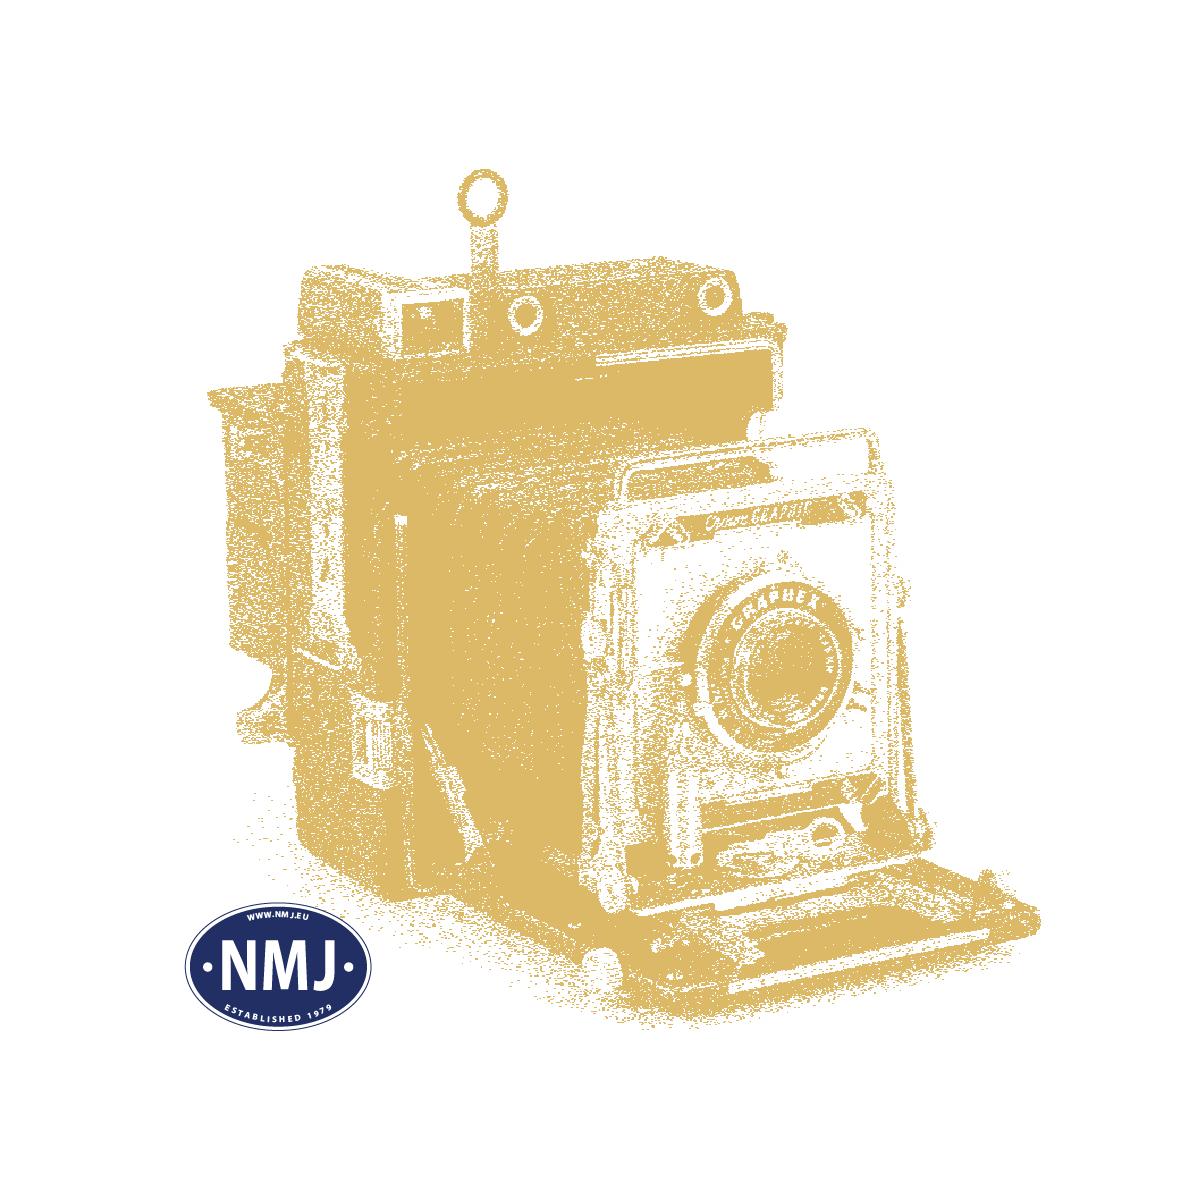 NMJ0.21504 - NMJ Superline Modell des Personen/Gepäckwagens BF10.21504 der NSB, Spur 0